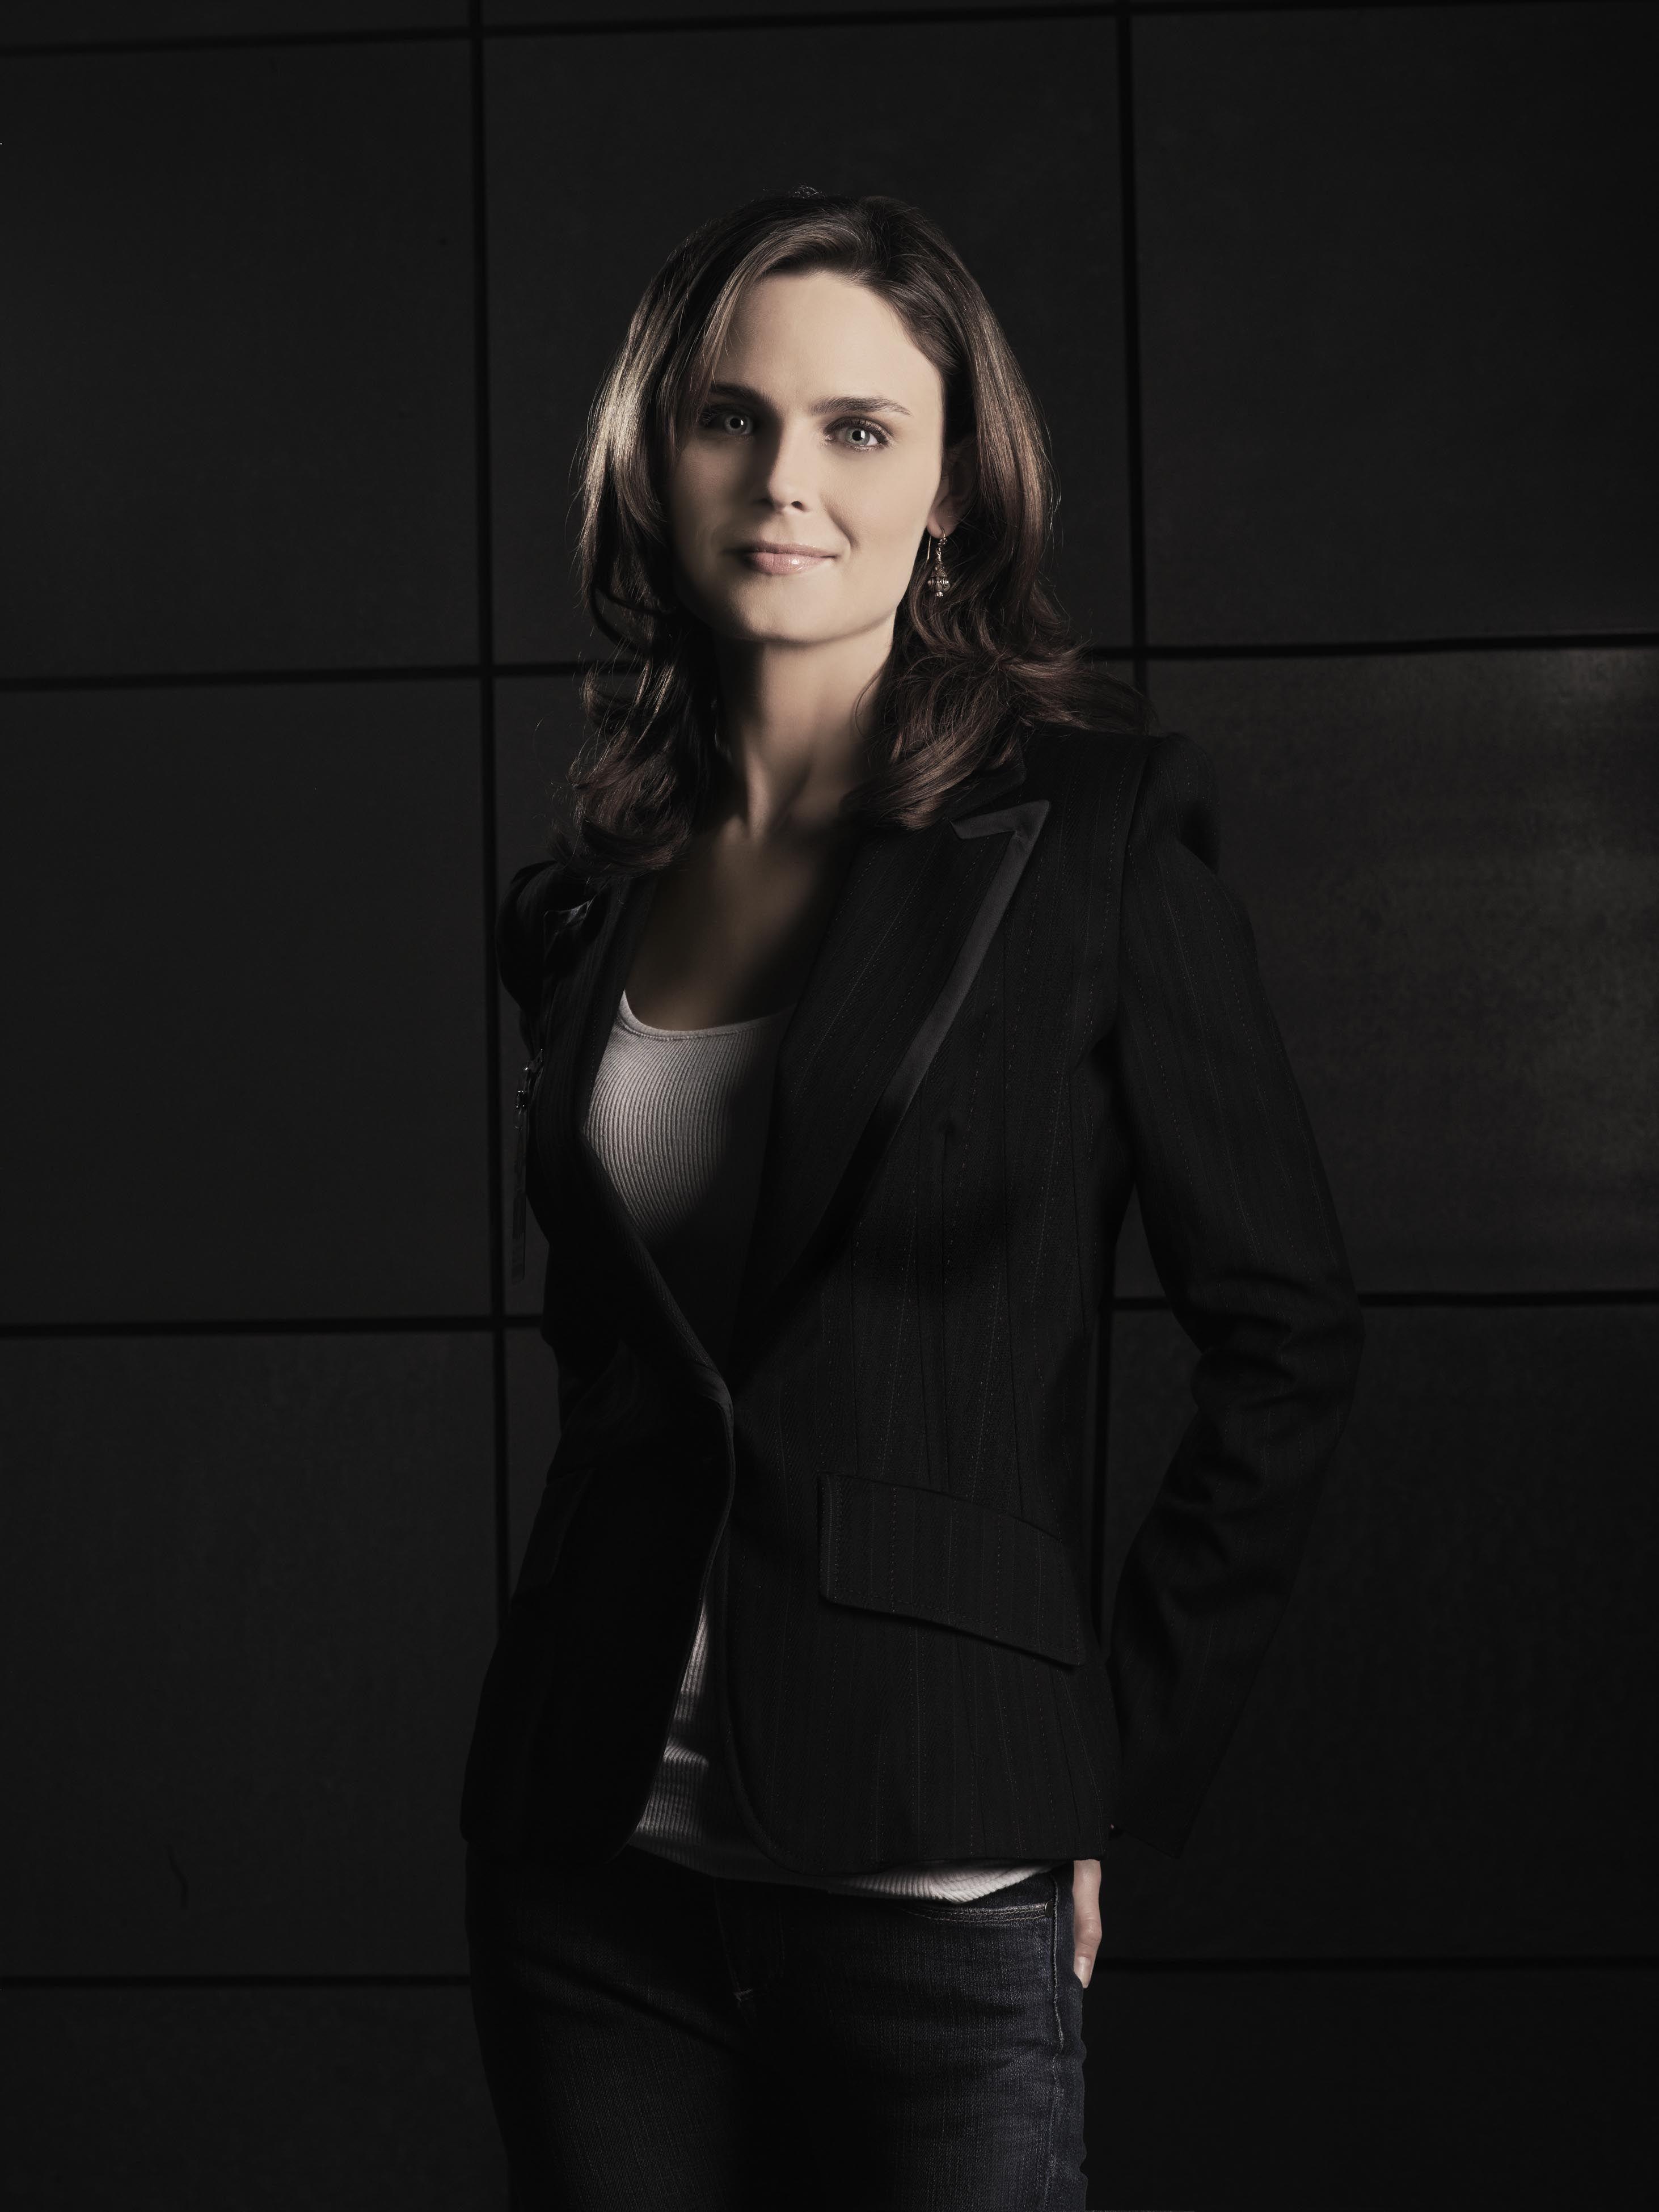 Bones S2 Emily Deschanel as